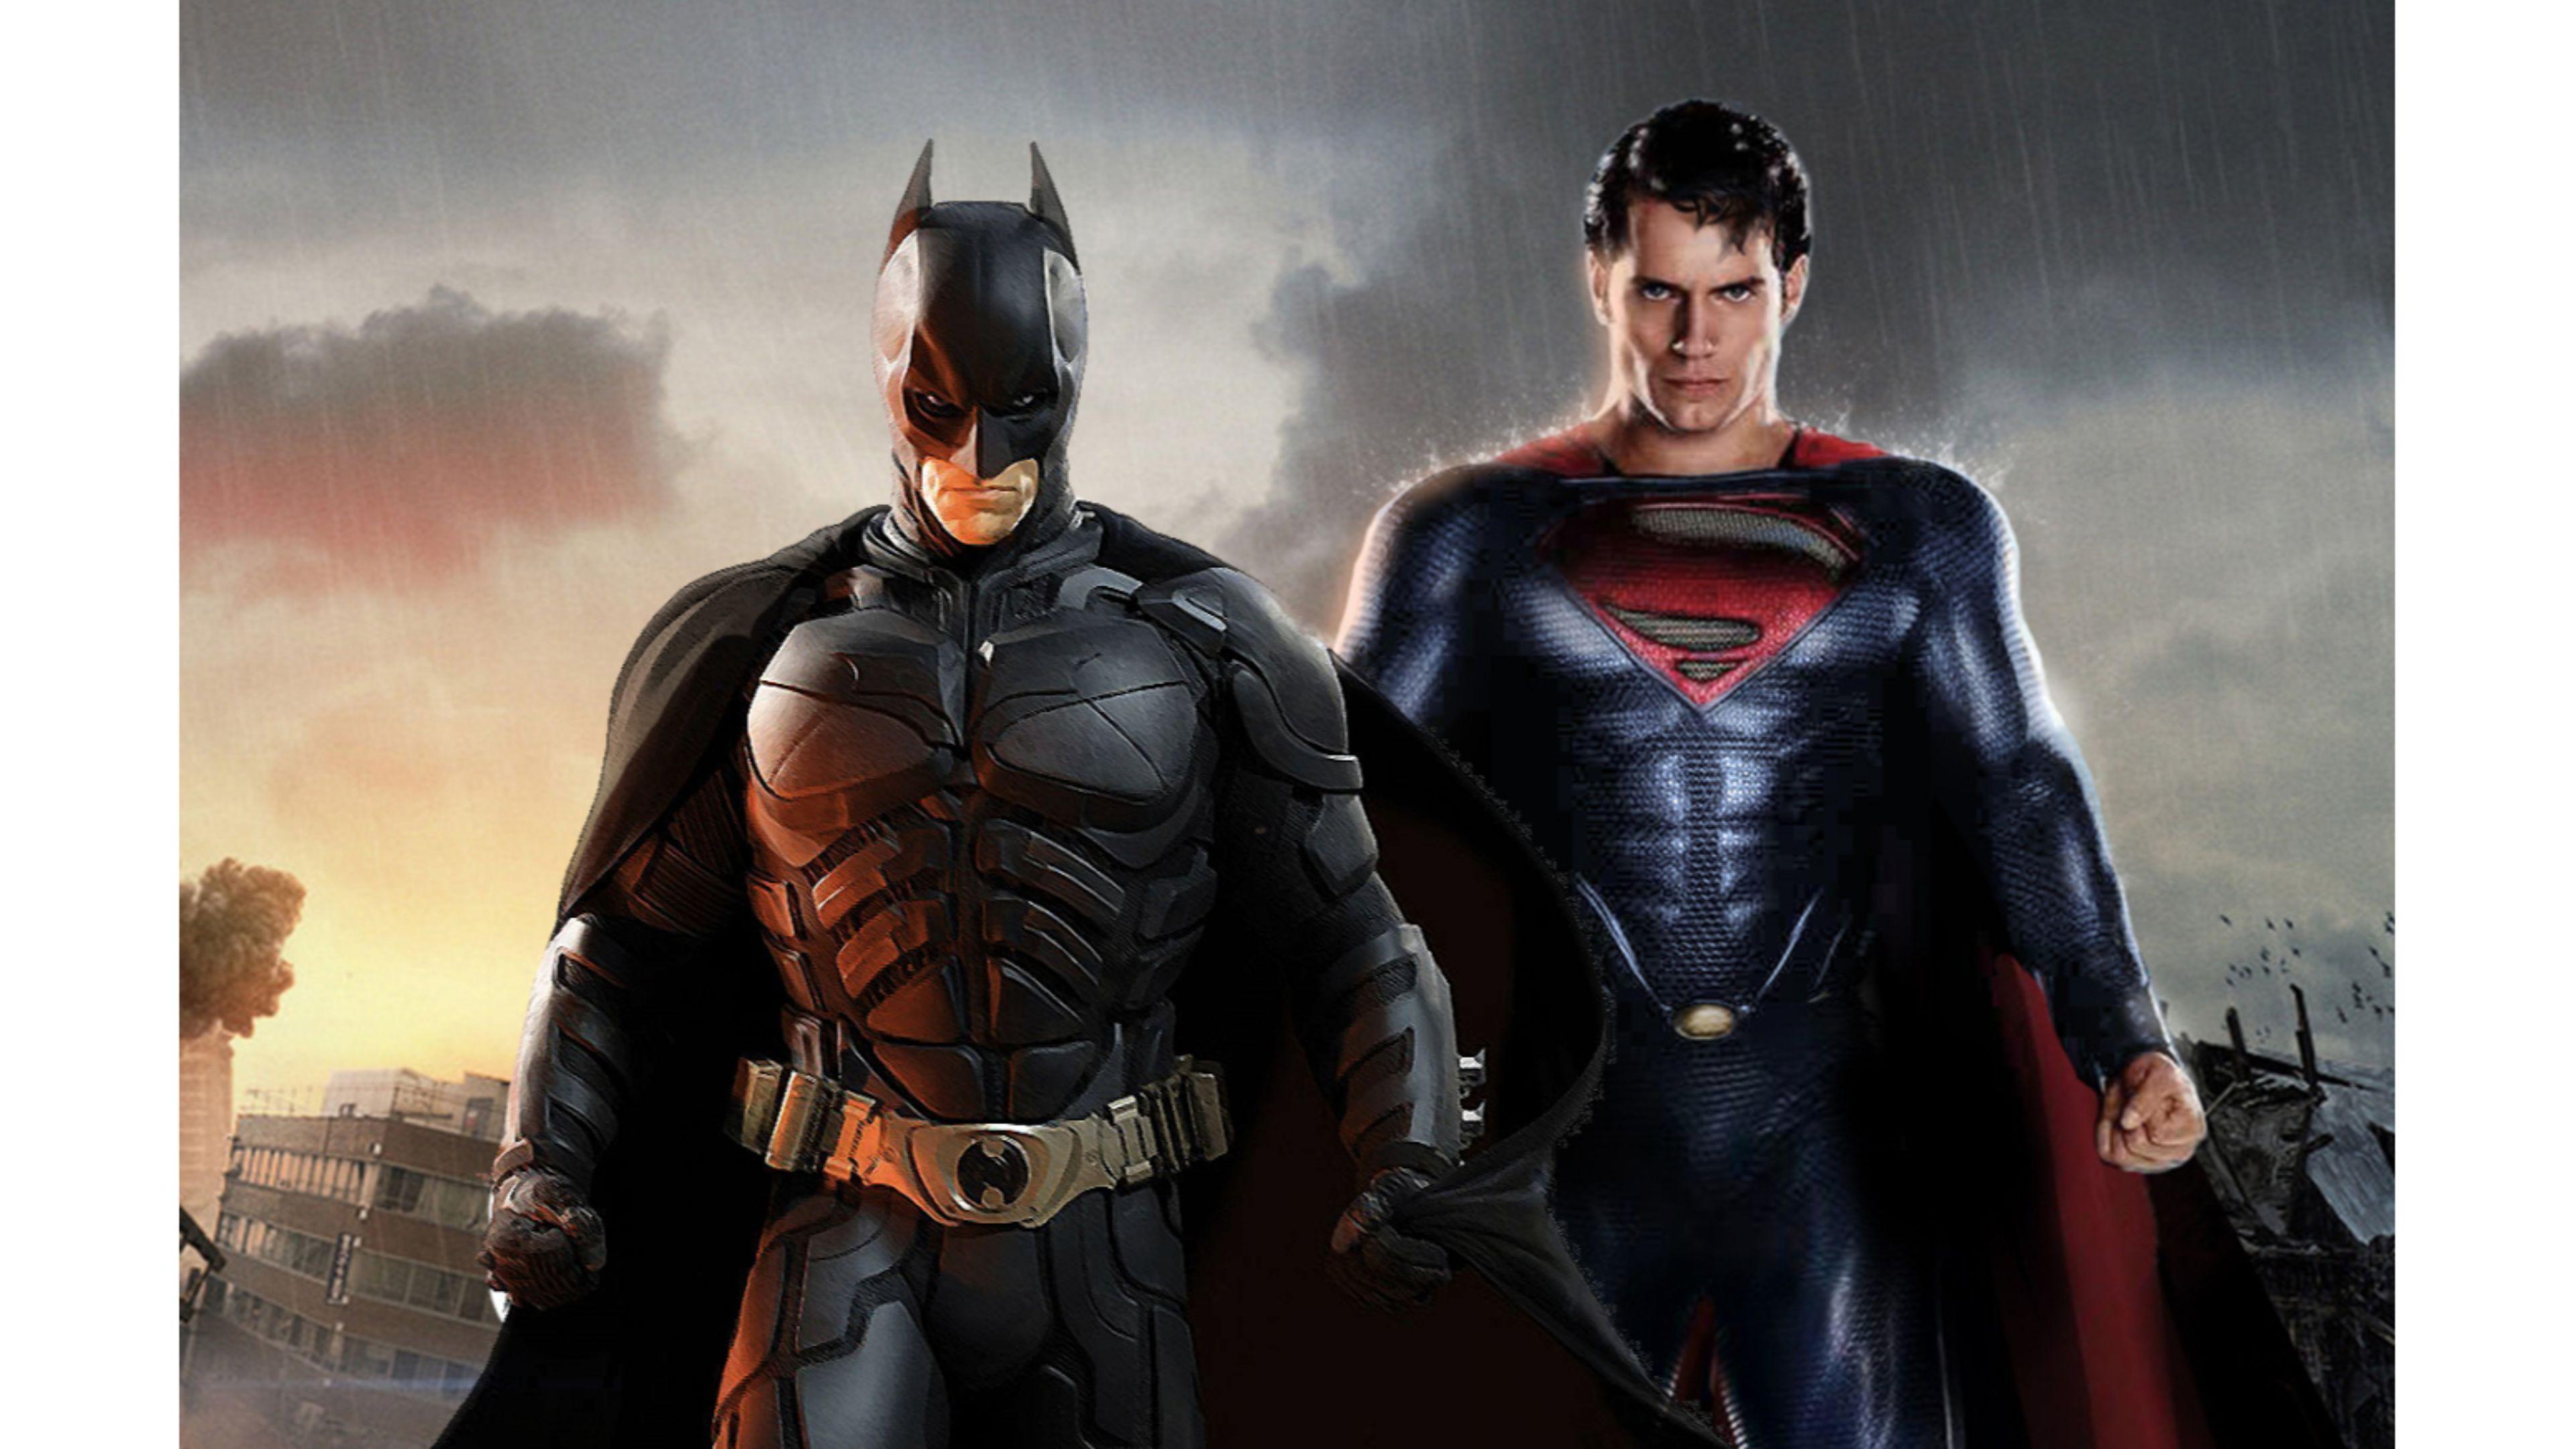 New Download Batman v Superman Movie 4K Wallpaper 4K Wallpaper 3840x2160